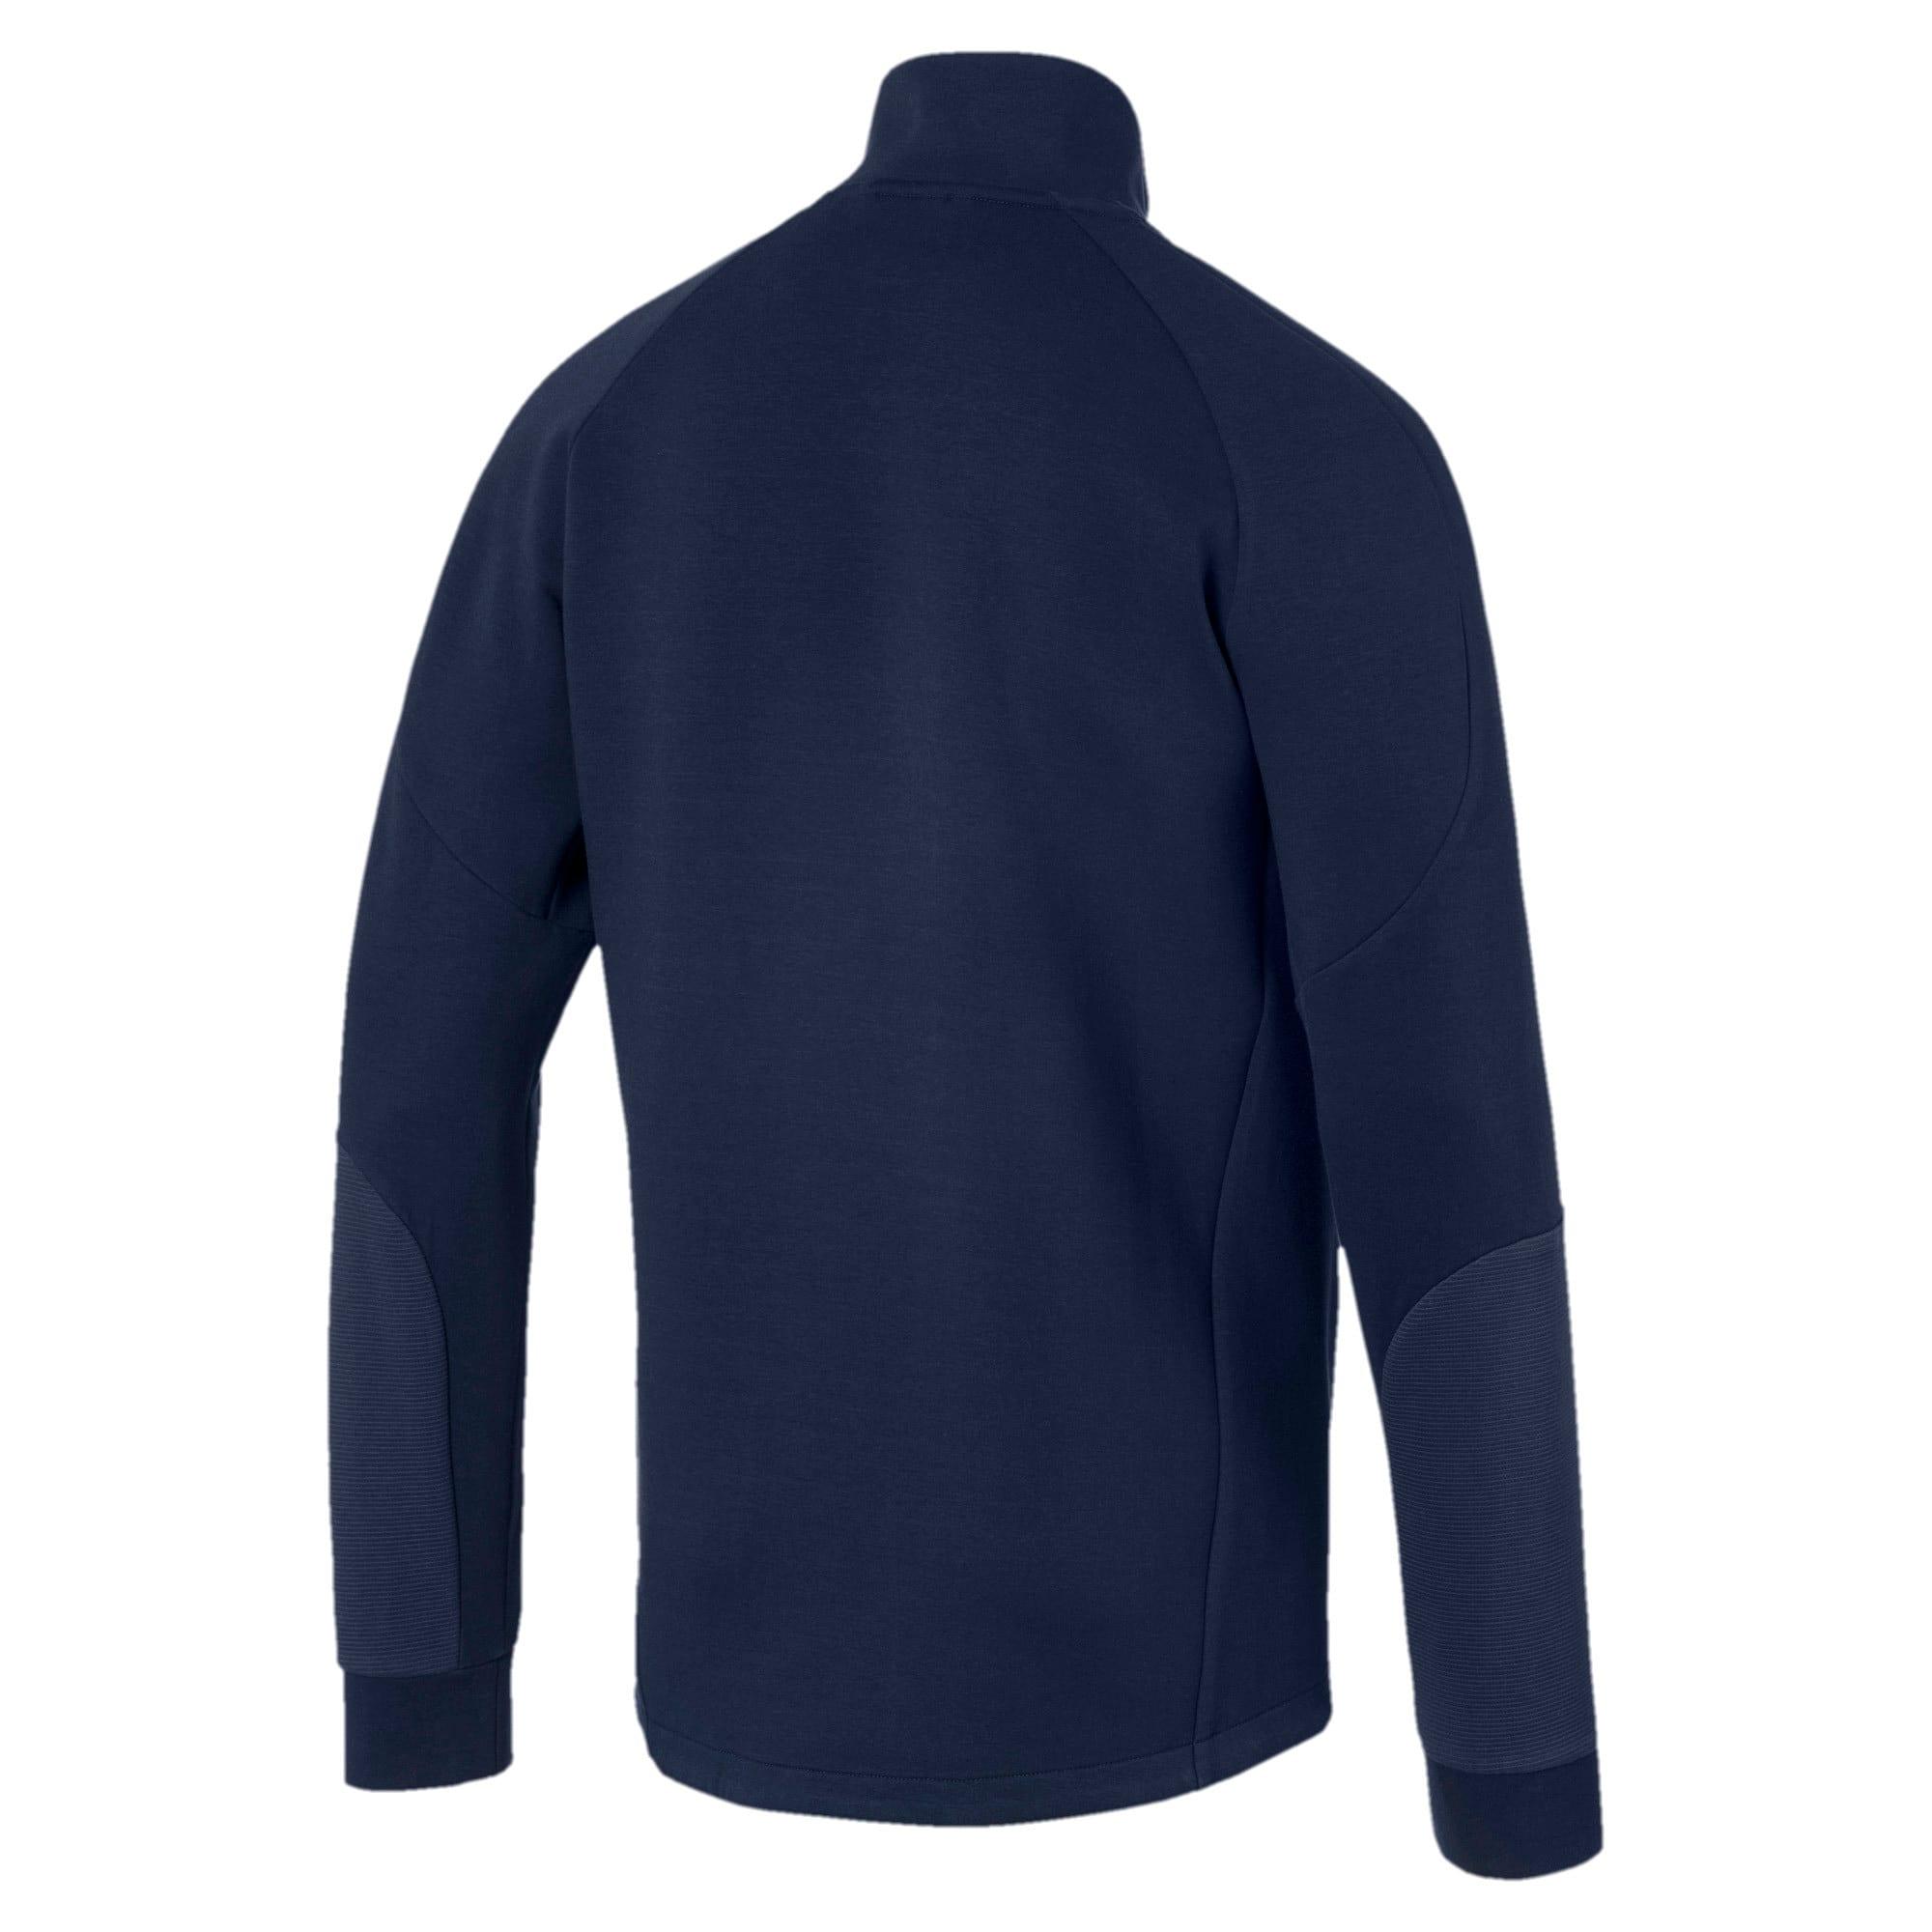 Thumbnail 5 of Evostripe Long Sleeve Men's Jacket, Peacoat, medium